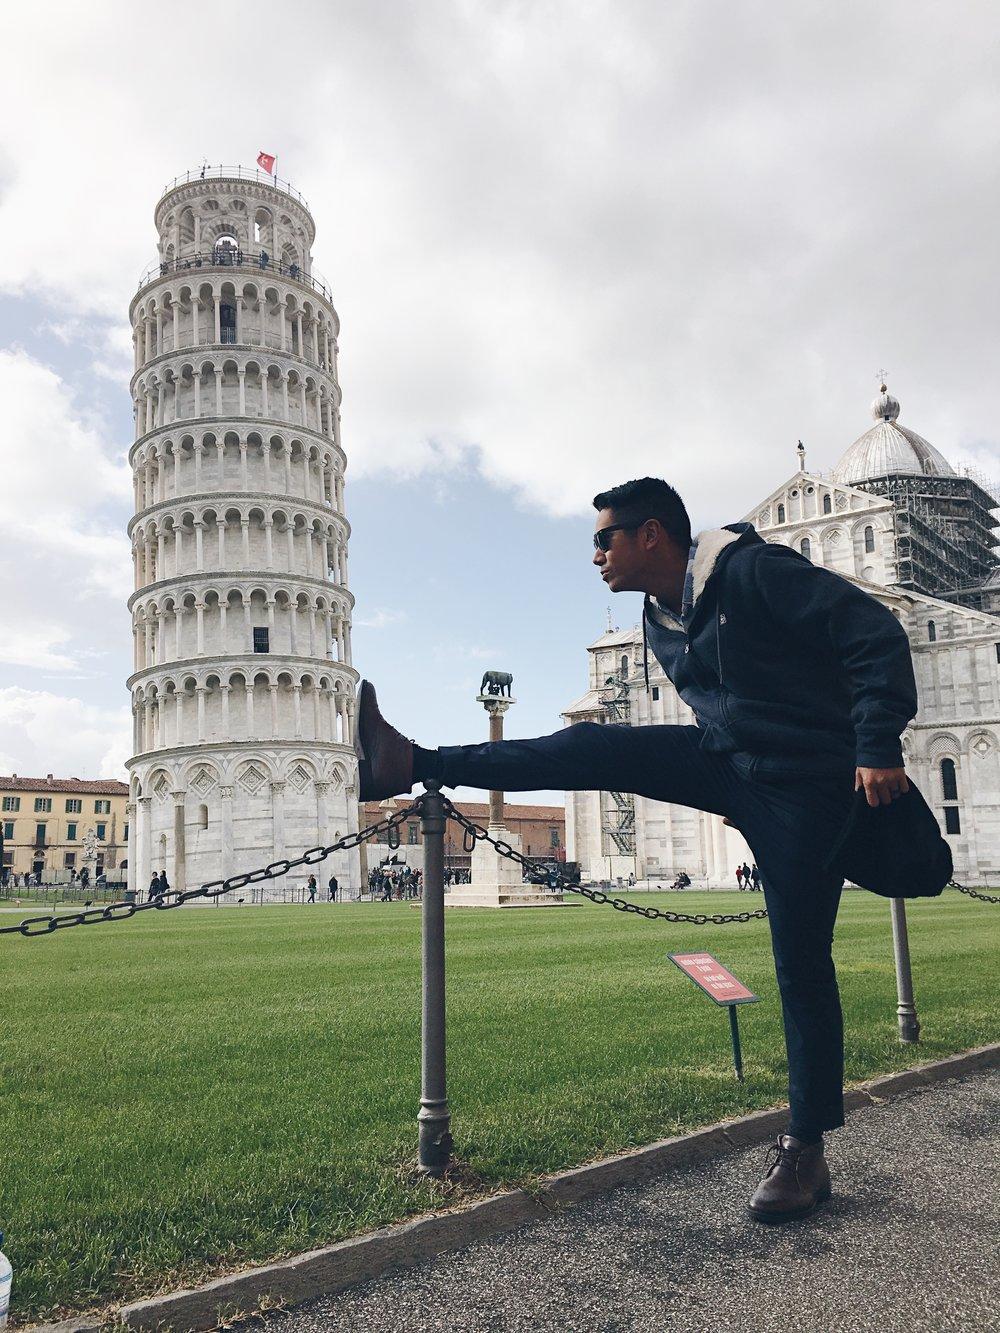 vergs-leaning-tower-pisa